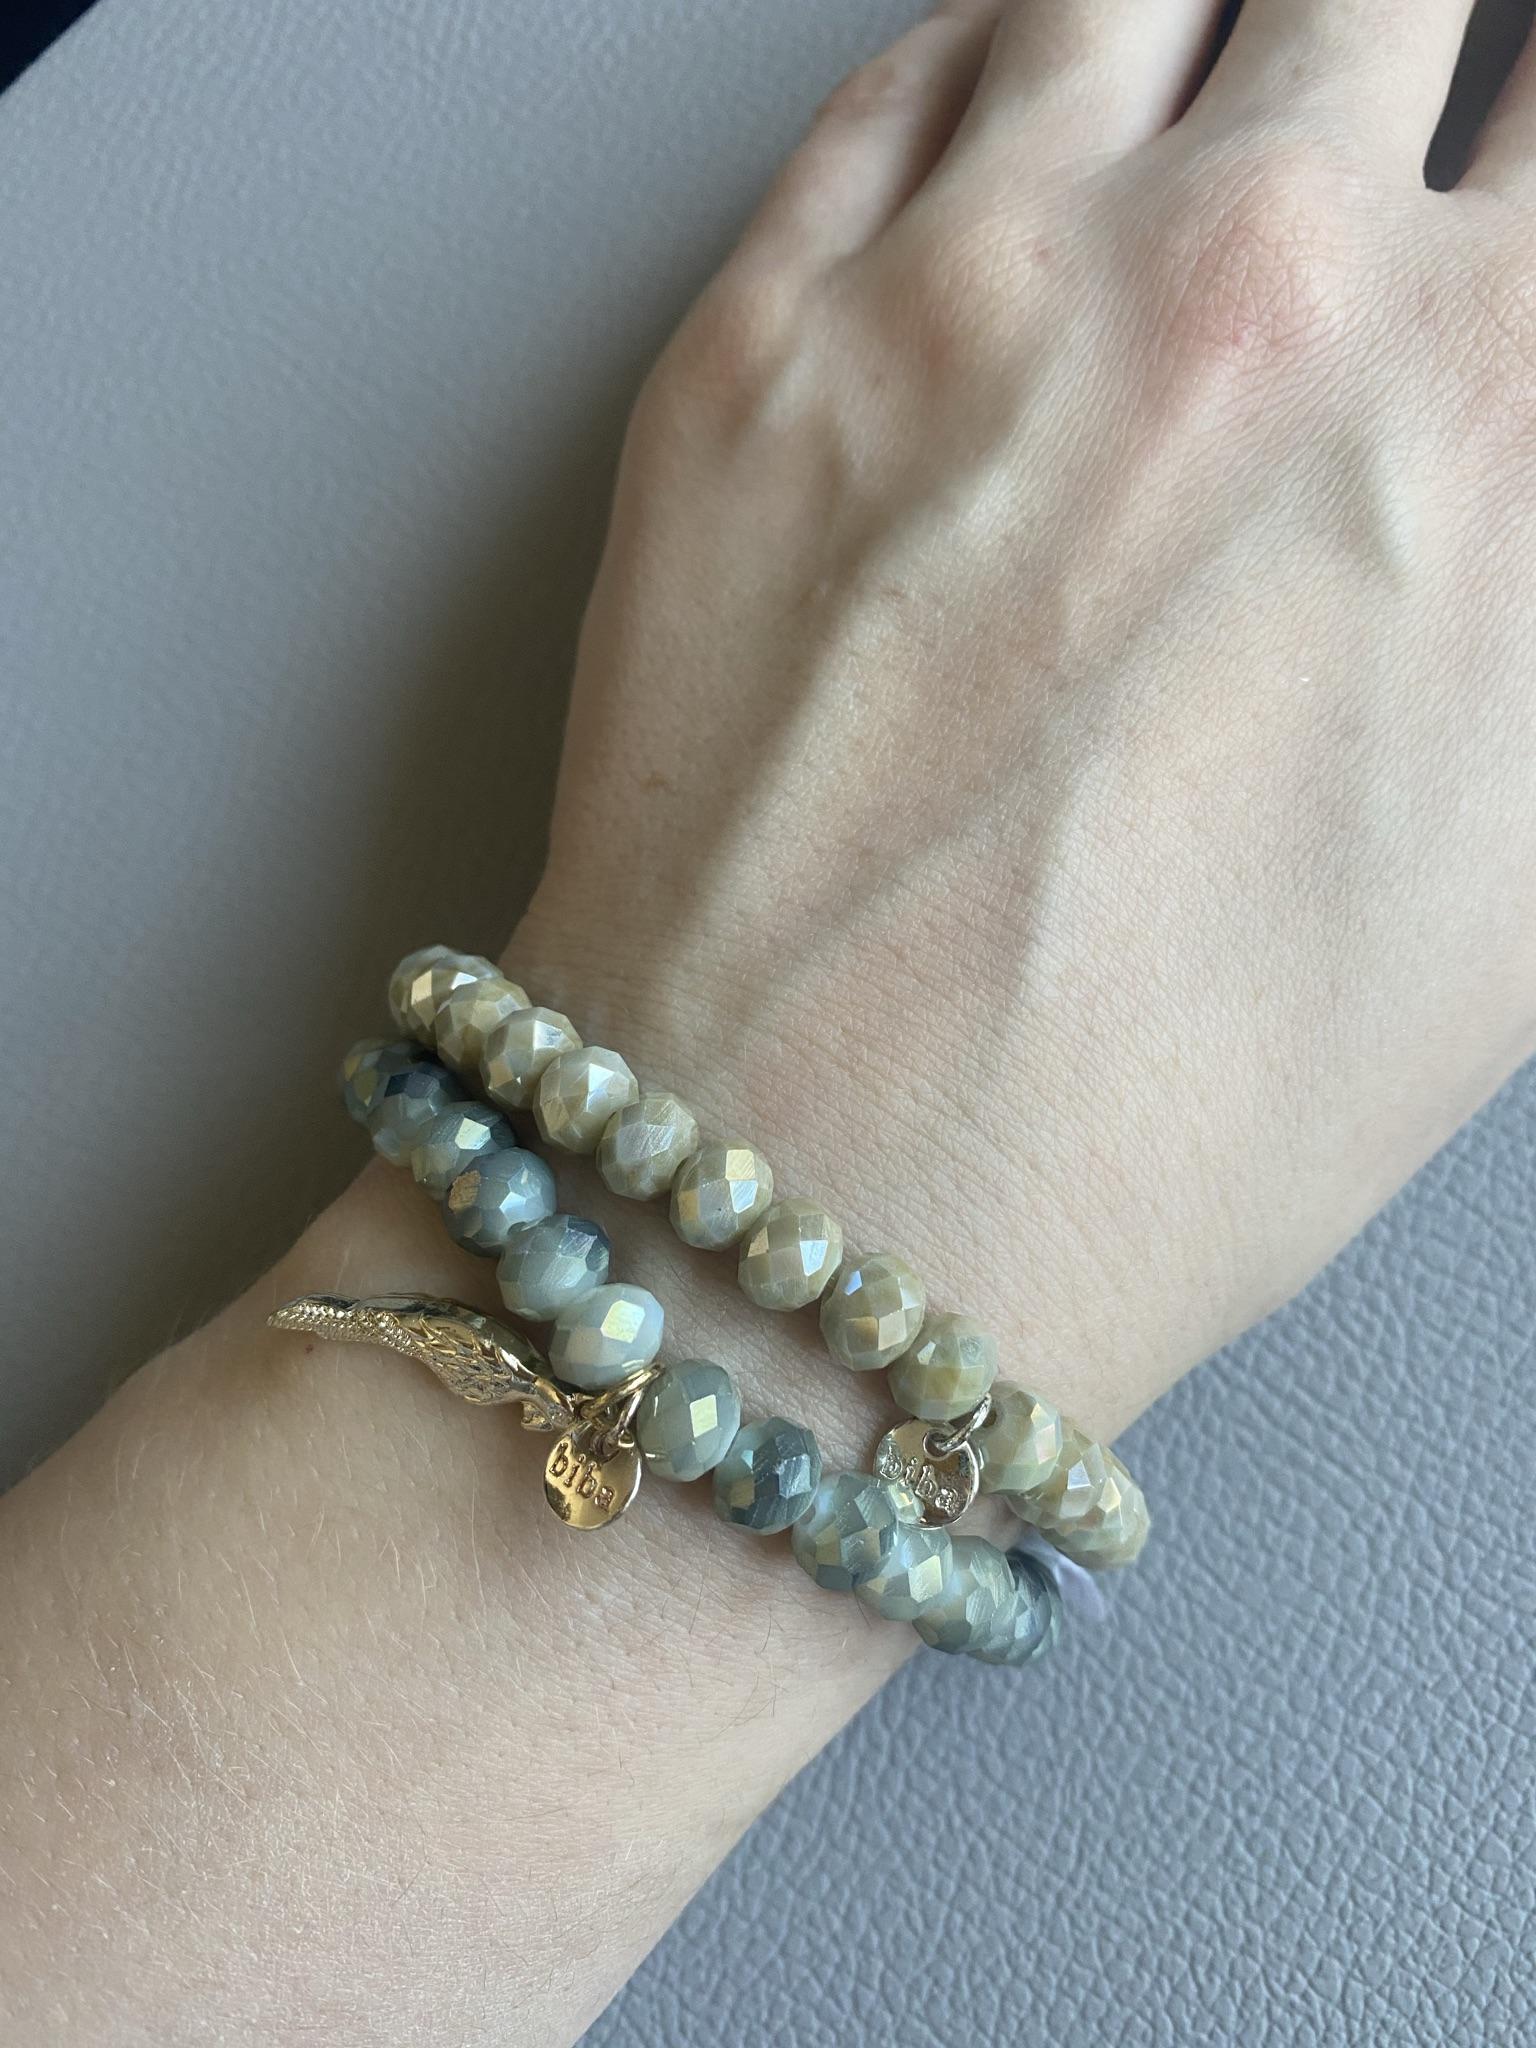 Biba Armband grün/silber